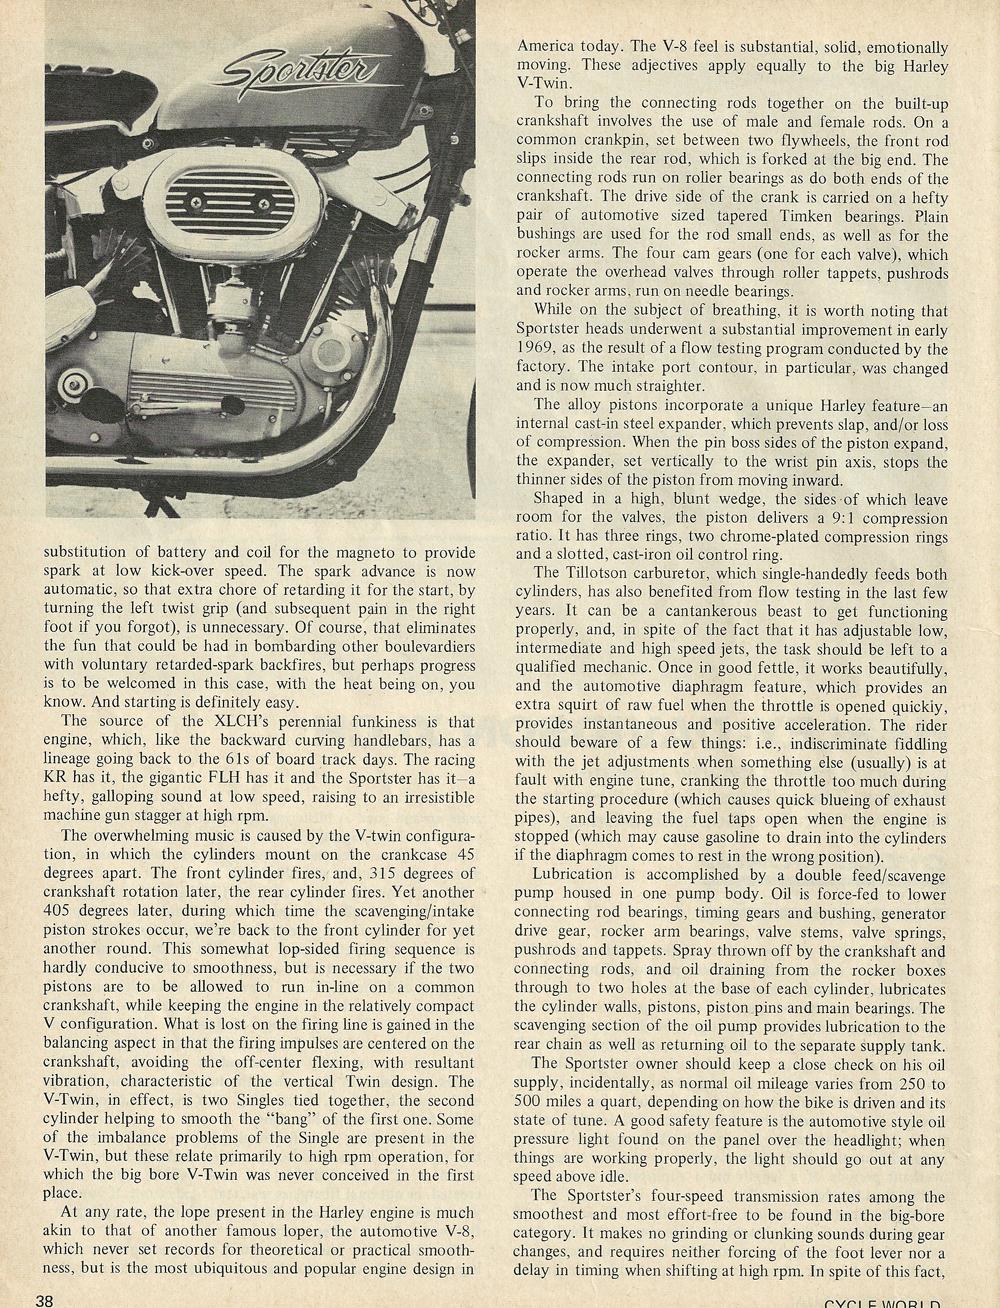 1969 Harley Davidson Sportster XLCH road test 2.jpg